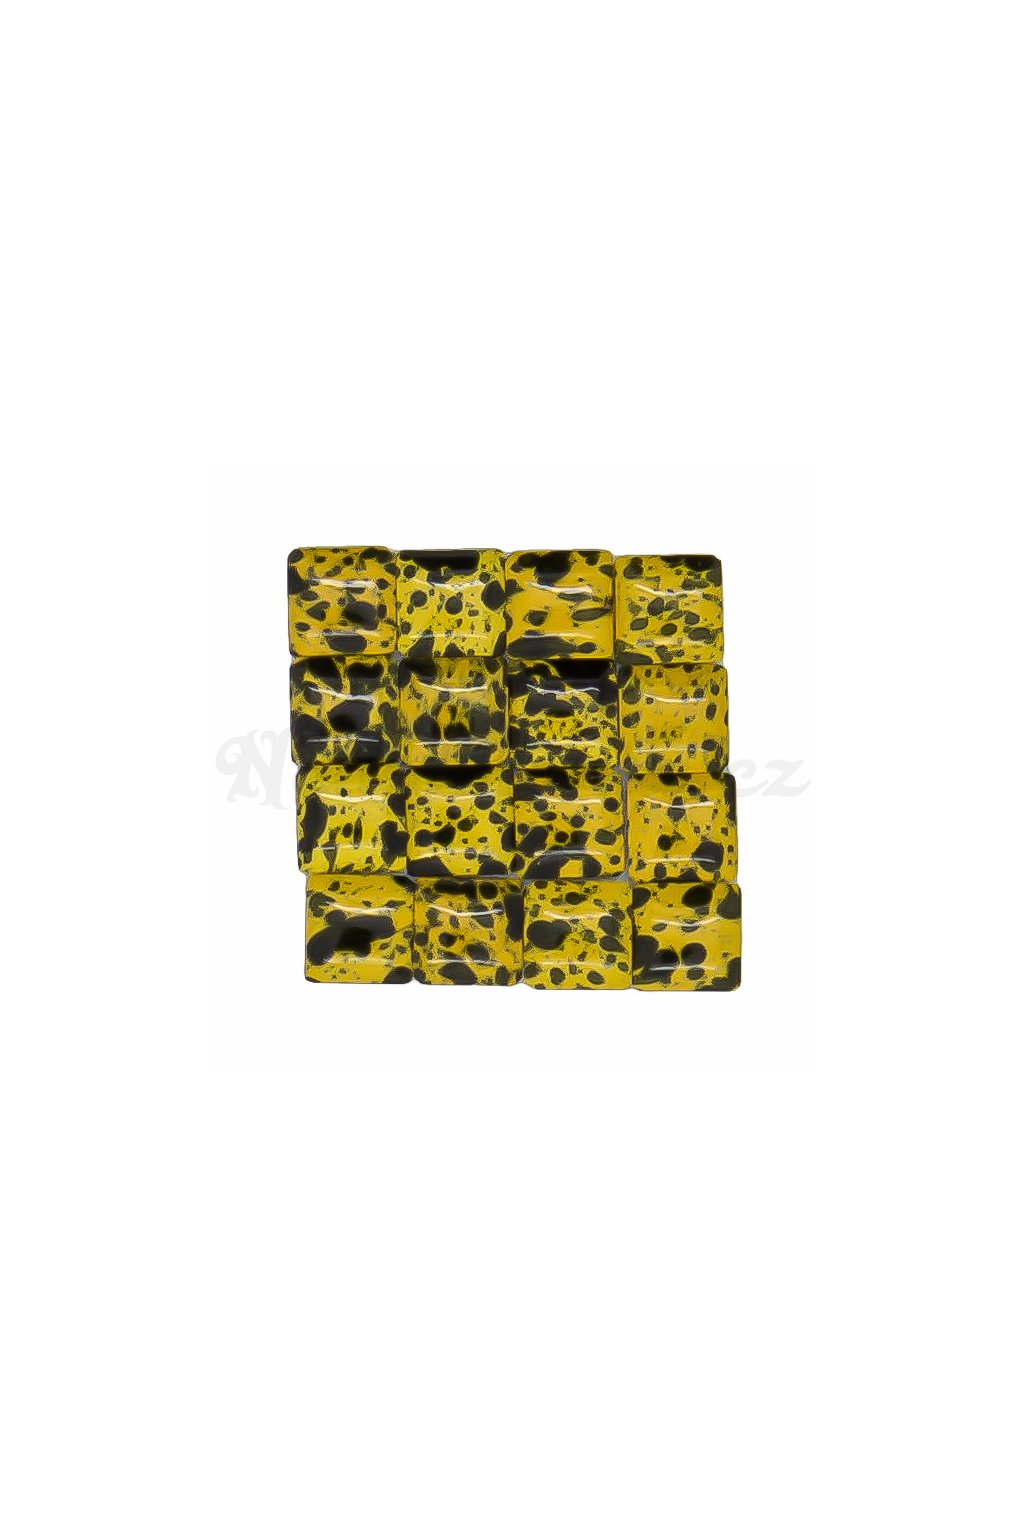 23279 lentilky leopardi zlute